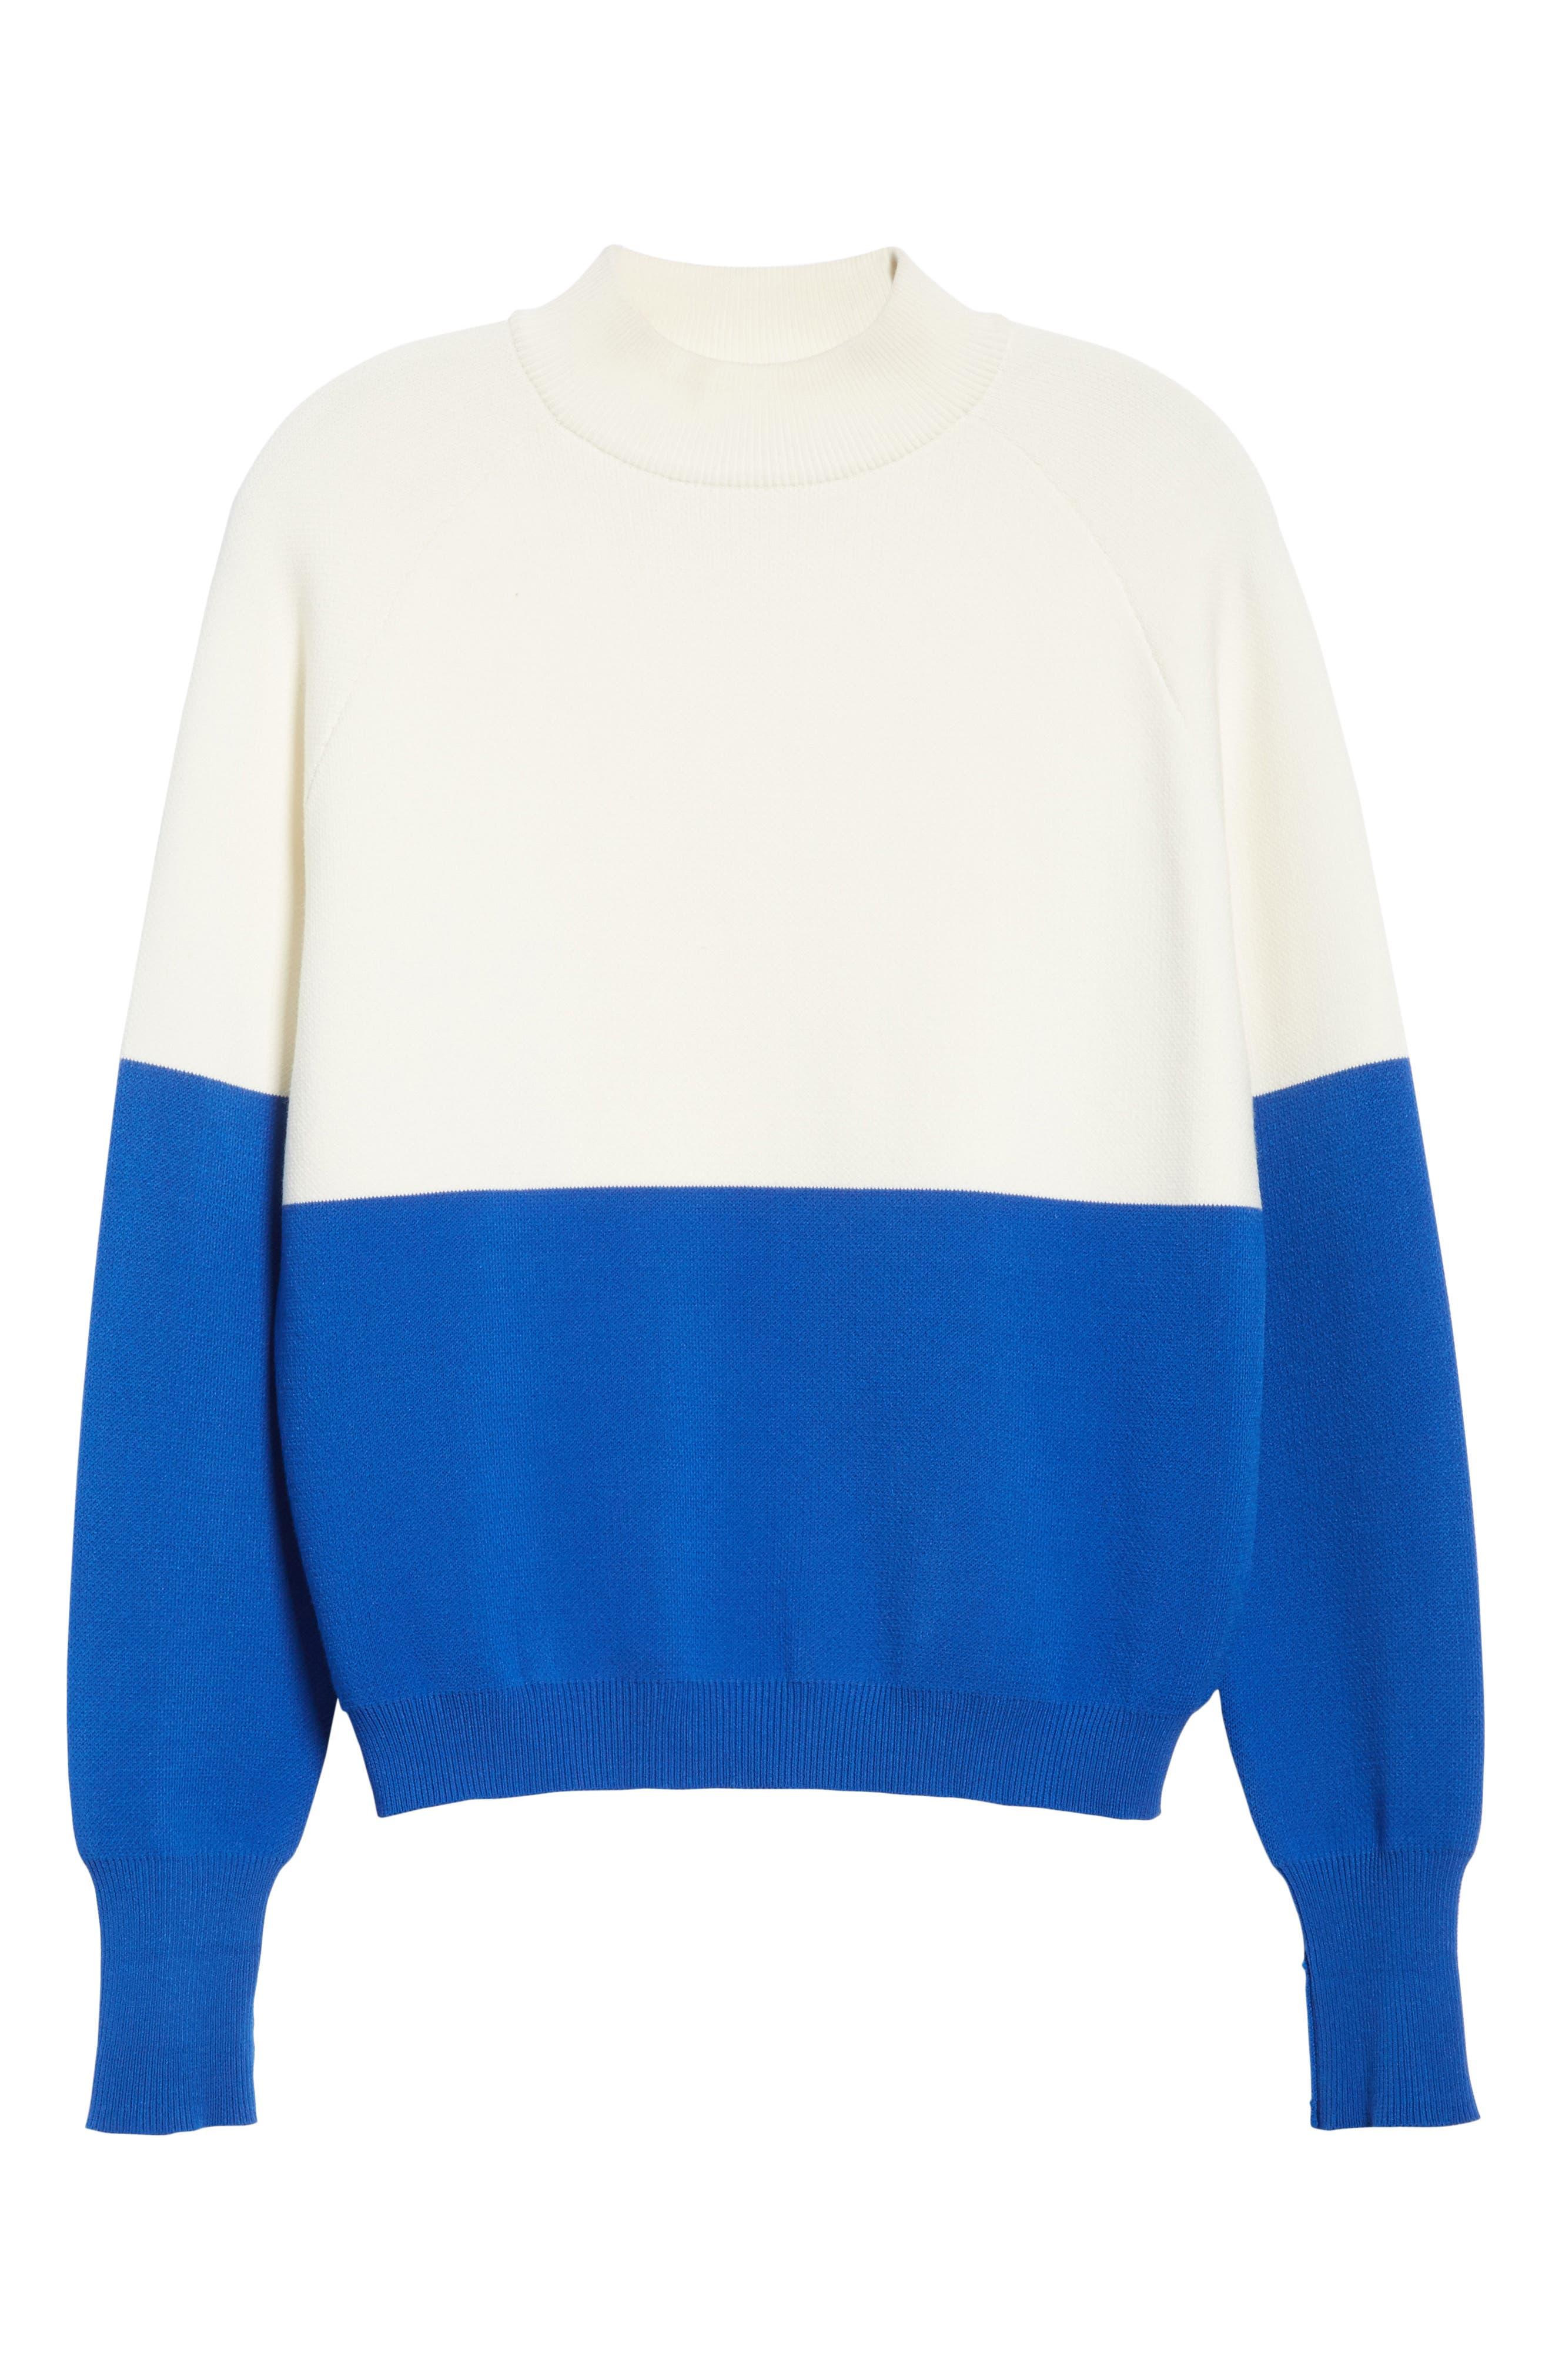 Colorblock Raglan Sweater,                             Alternate thumbnail 7, color,                             Snow White/ Slalom Blue